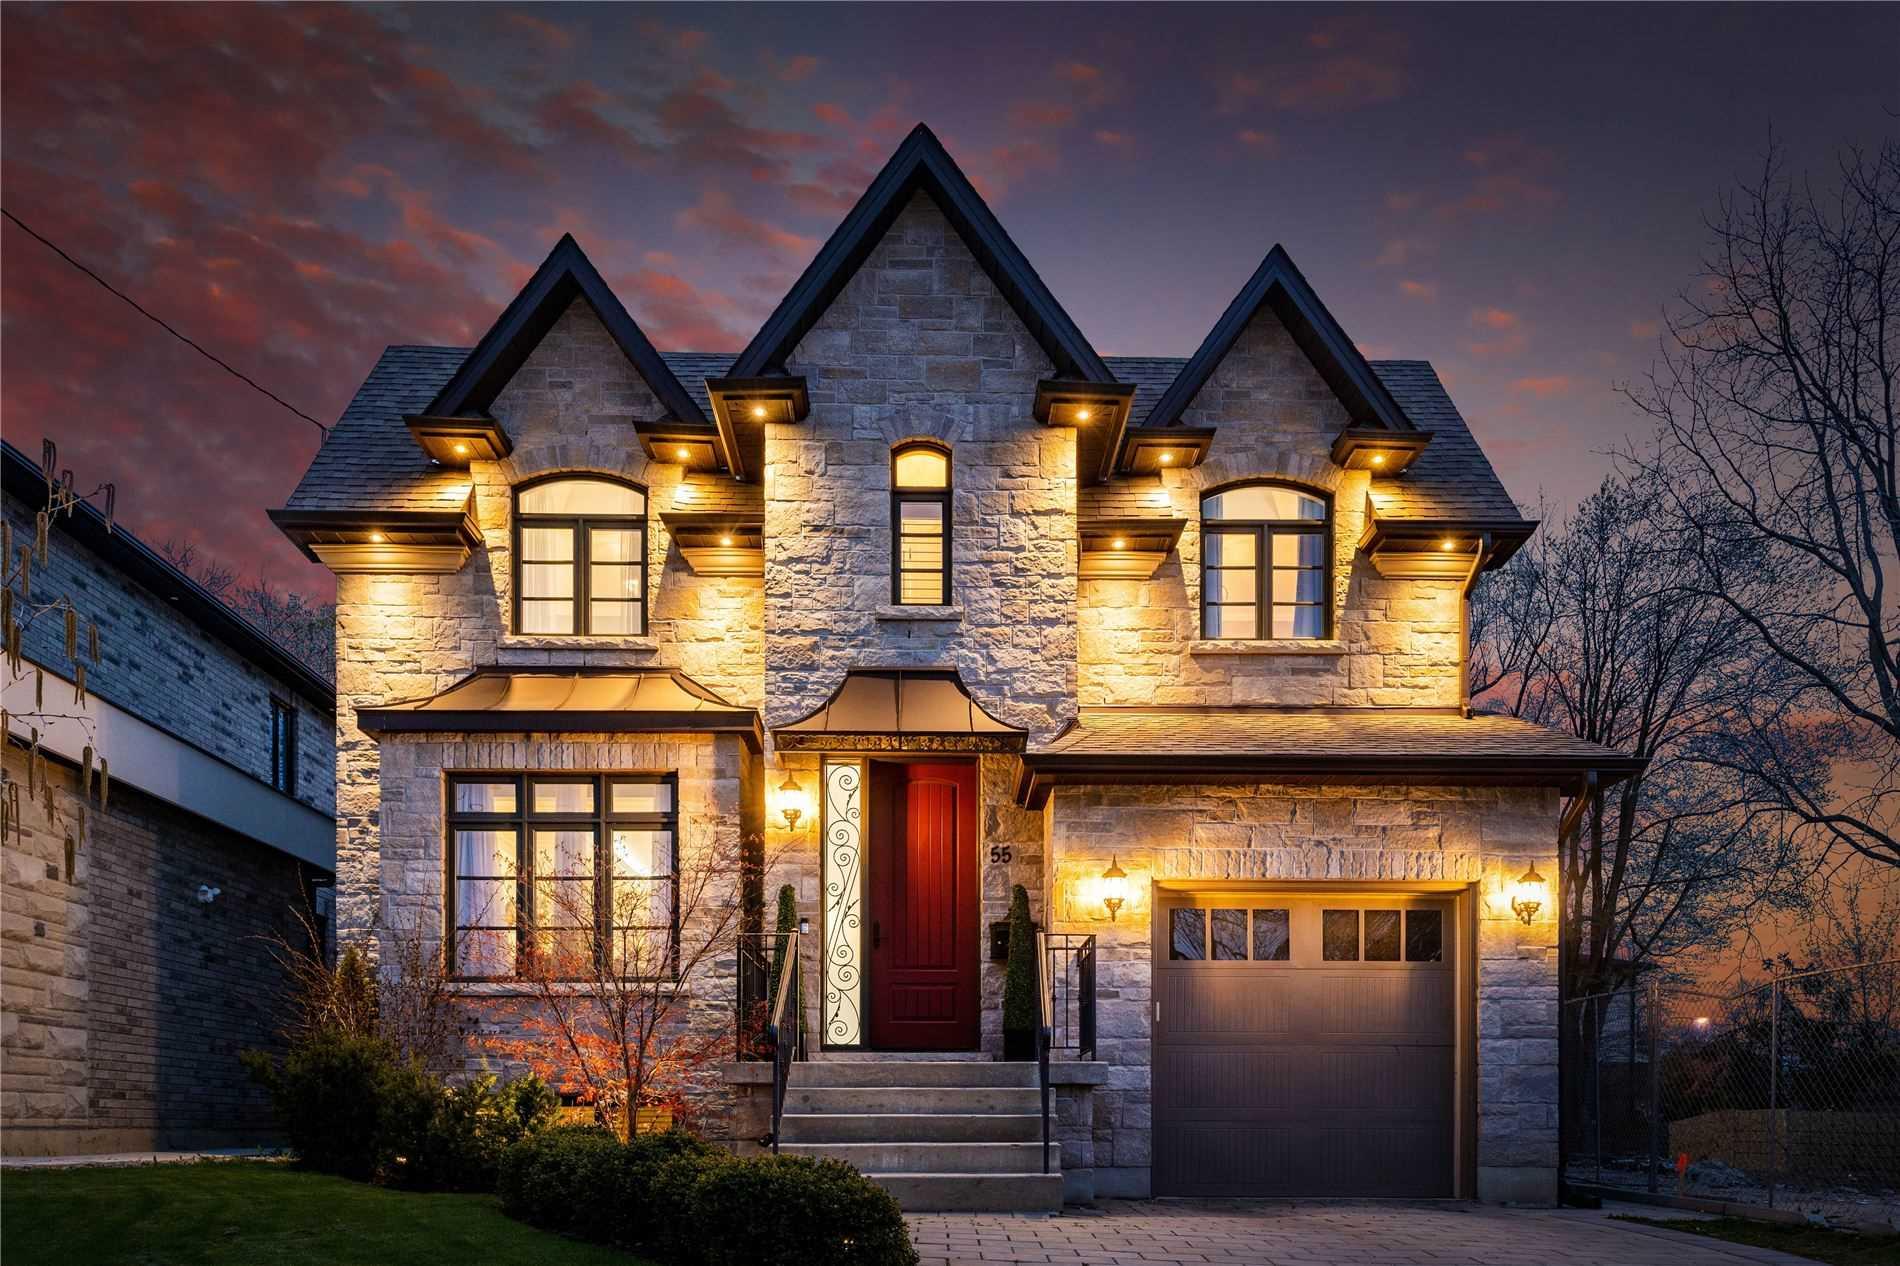 55 Dorset Rd, Toronto, Ontario M1M2S8, 4 Bedrooms Bedrooms, 9 Rooms Rooms,5 BathroomsBathrooms,Detached,For Sale,Dorset,E5228716